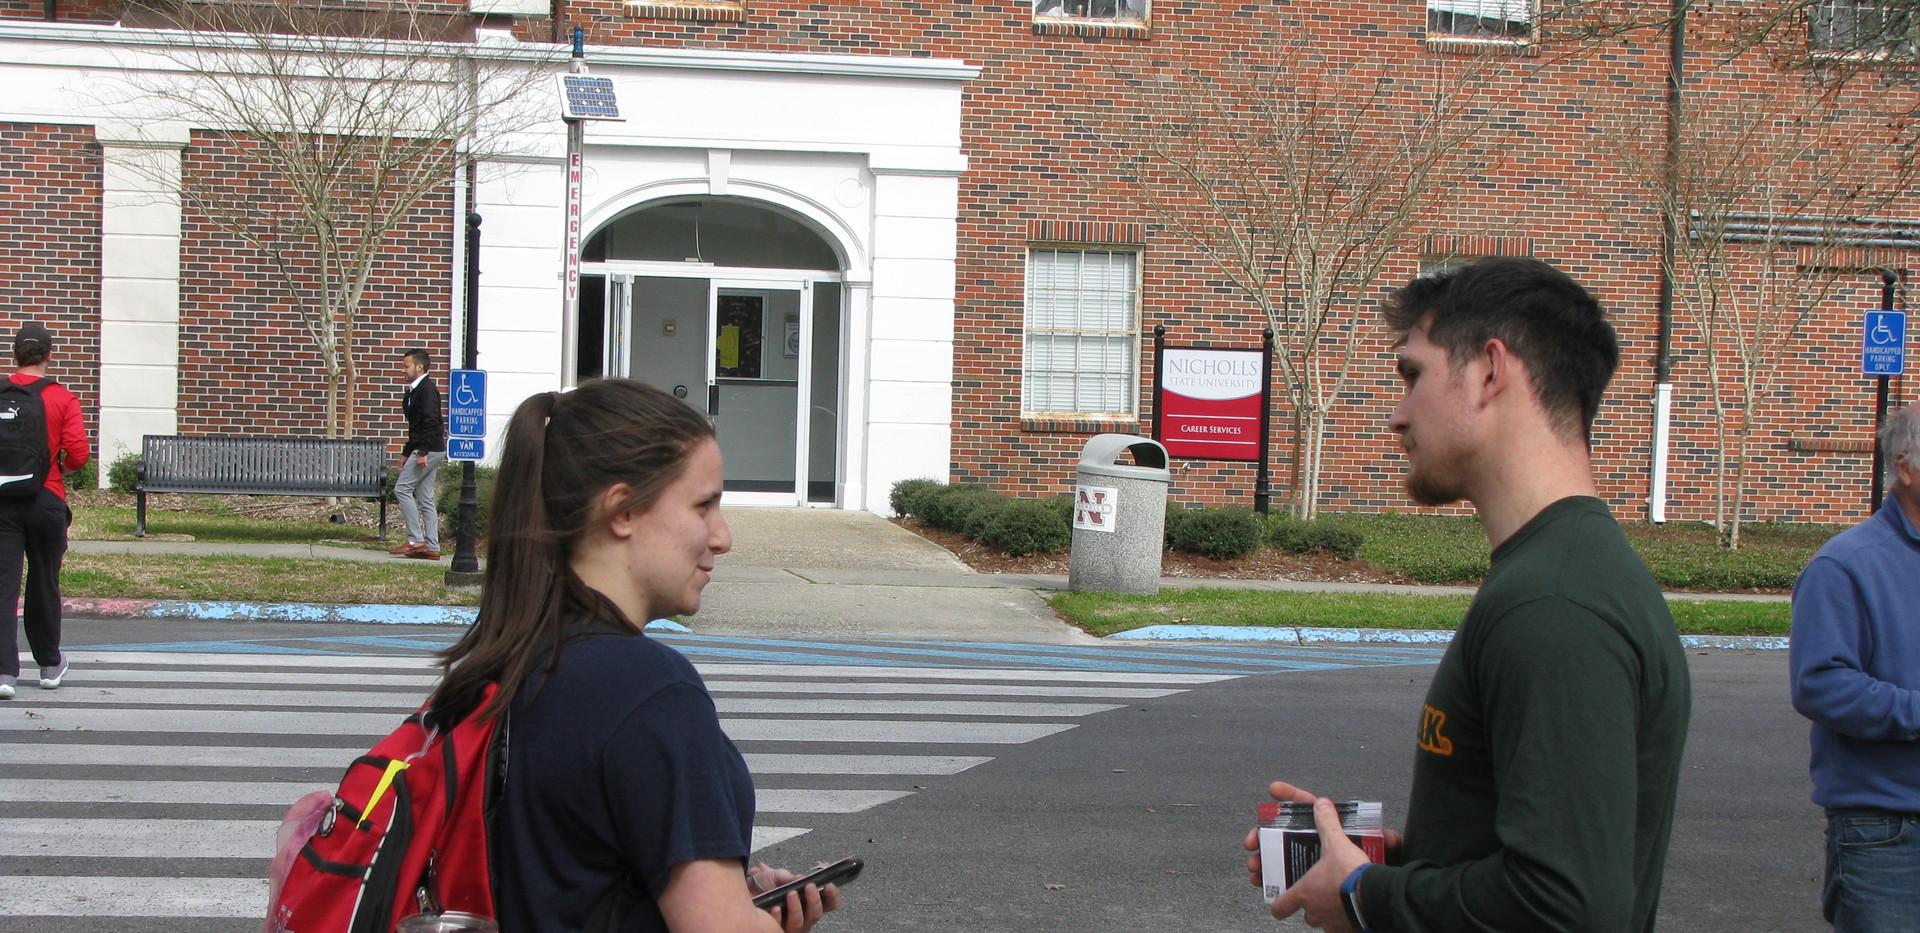 33. Seth sharing the gospel at Nicholls